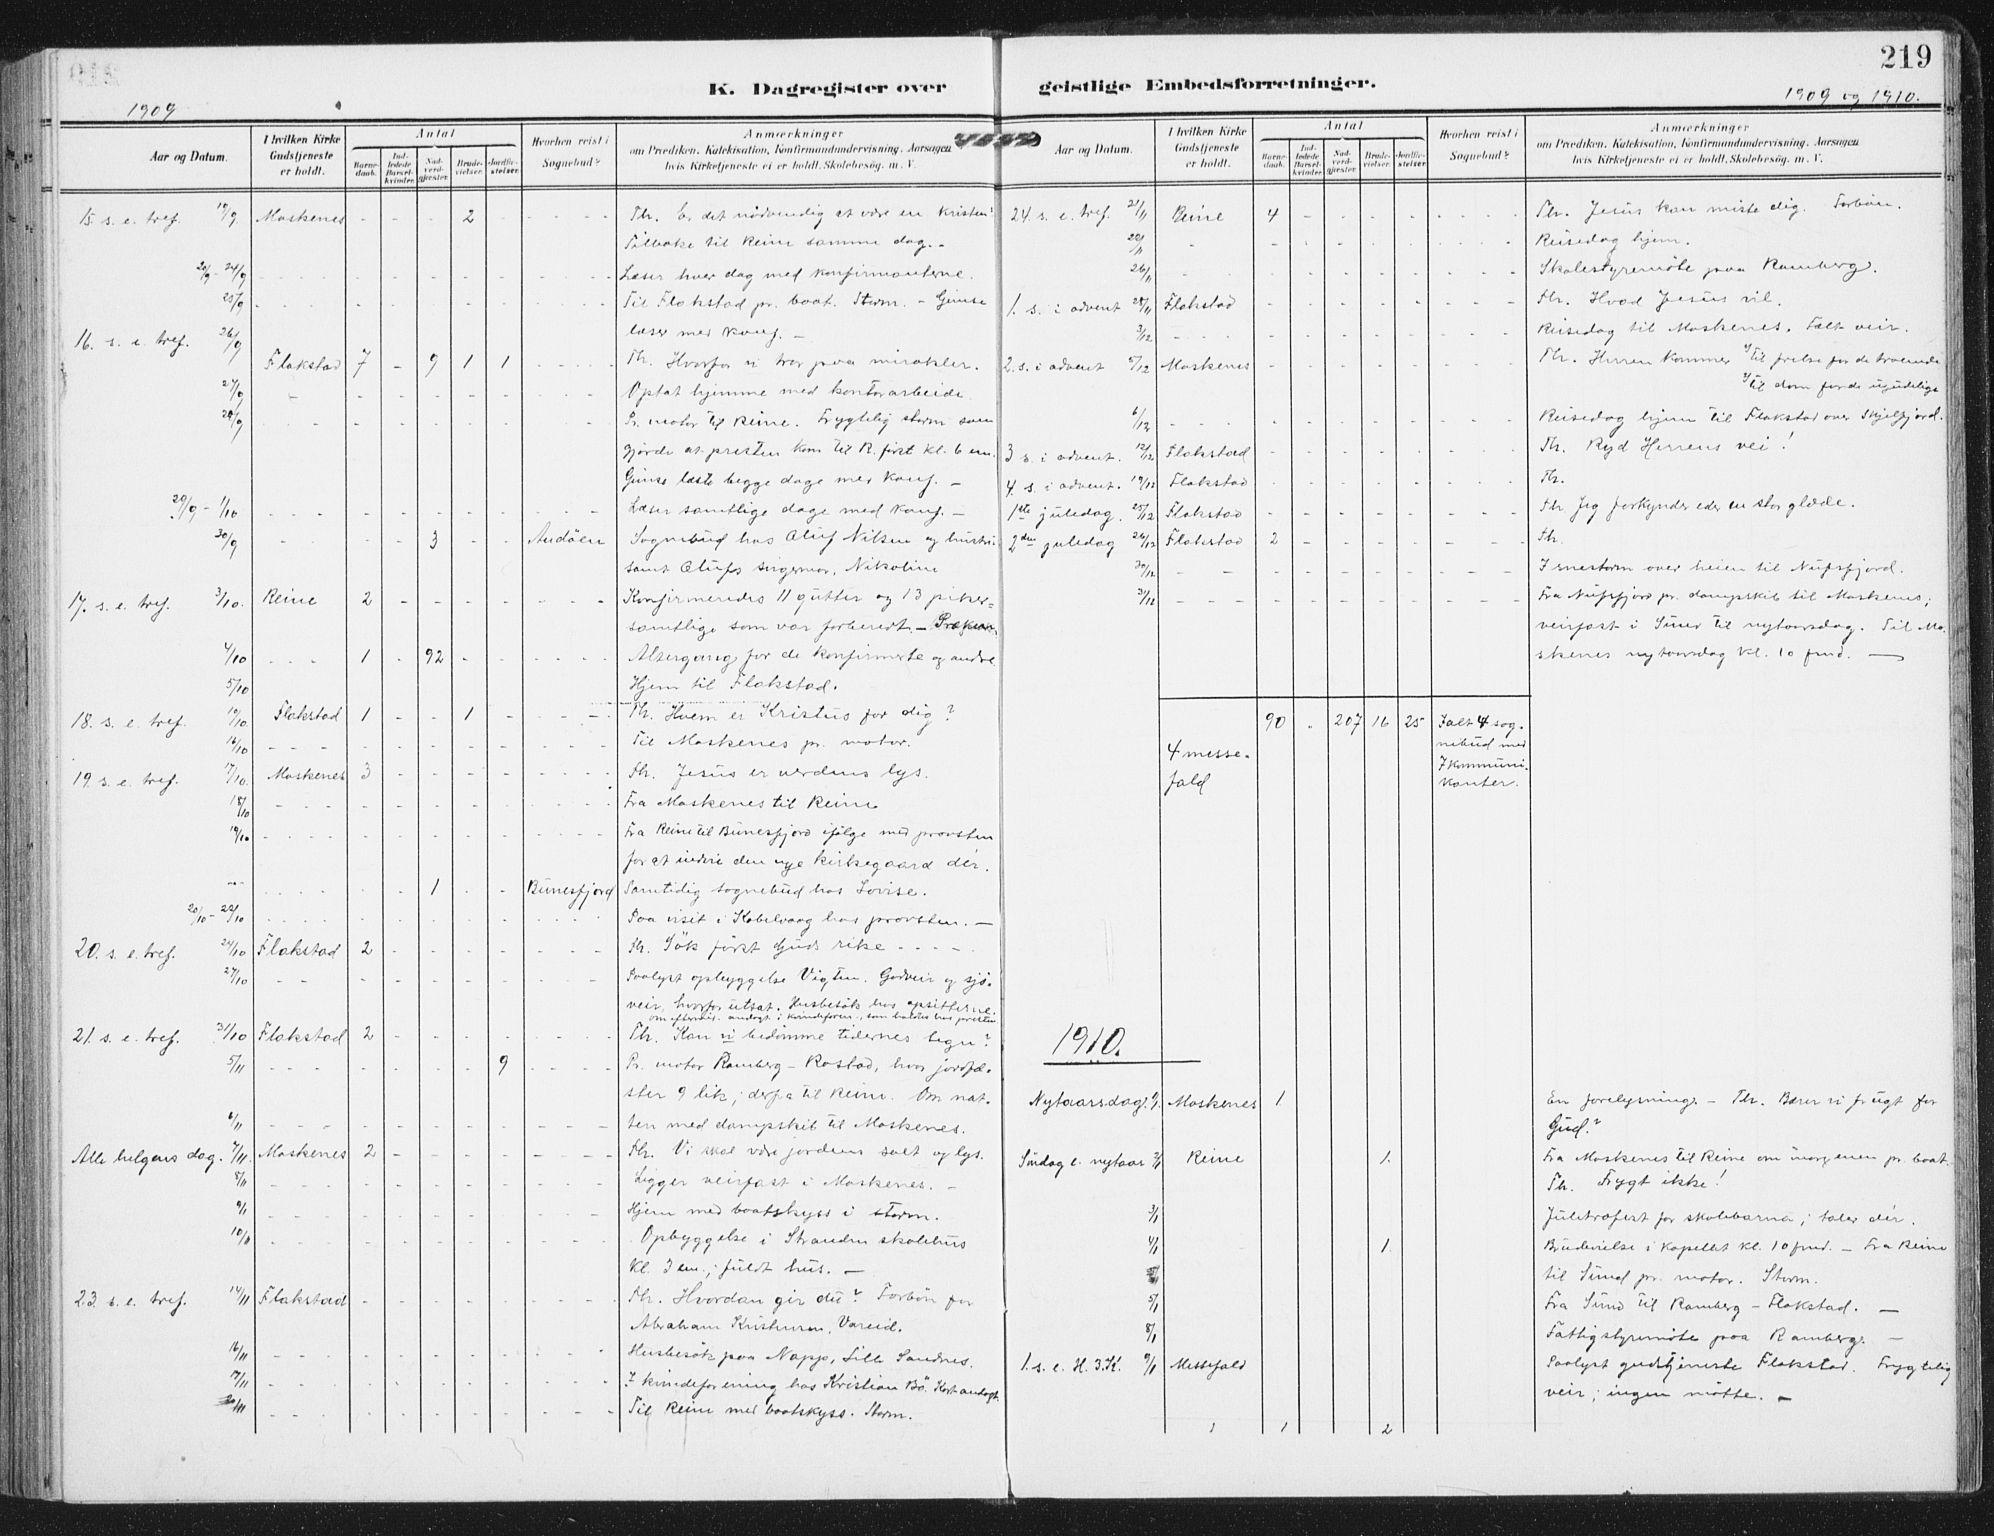 SAT, Ministerialprotokoller, klokkerbøker og fødselsregistre - Nordland, 885/L1206: Ministerialbok nr. 885A07, 1905-1915, s. 219